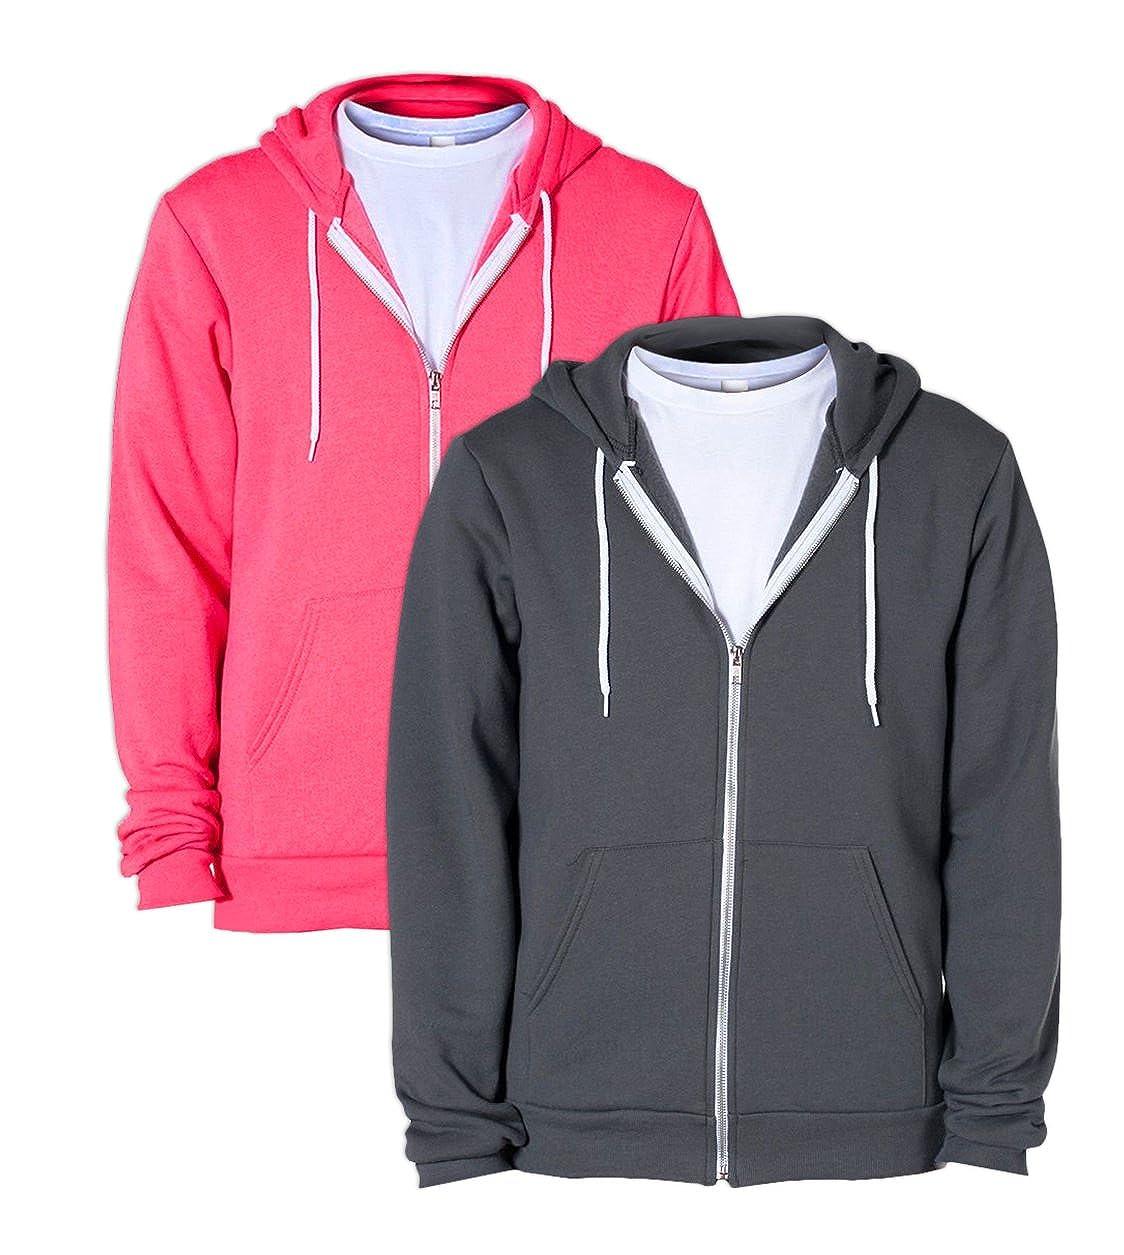 American Apparel F497 Unisex Flex Fleece Zip Hoodie XS 1 Asphalt 1 Deep Pink